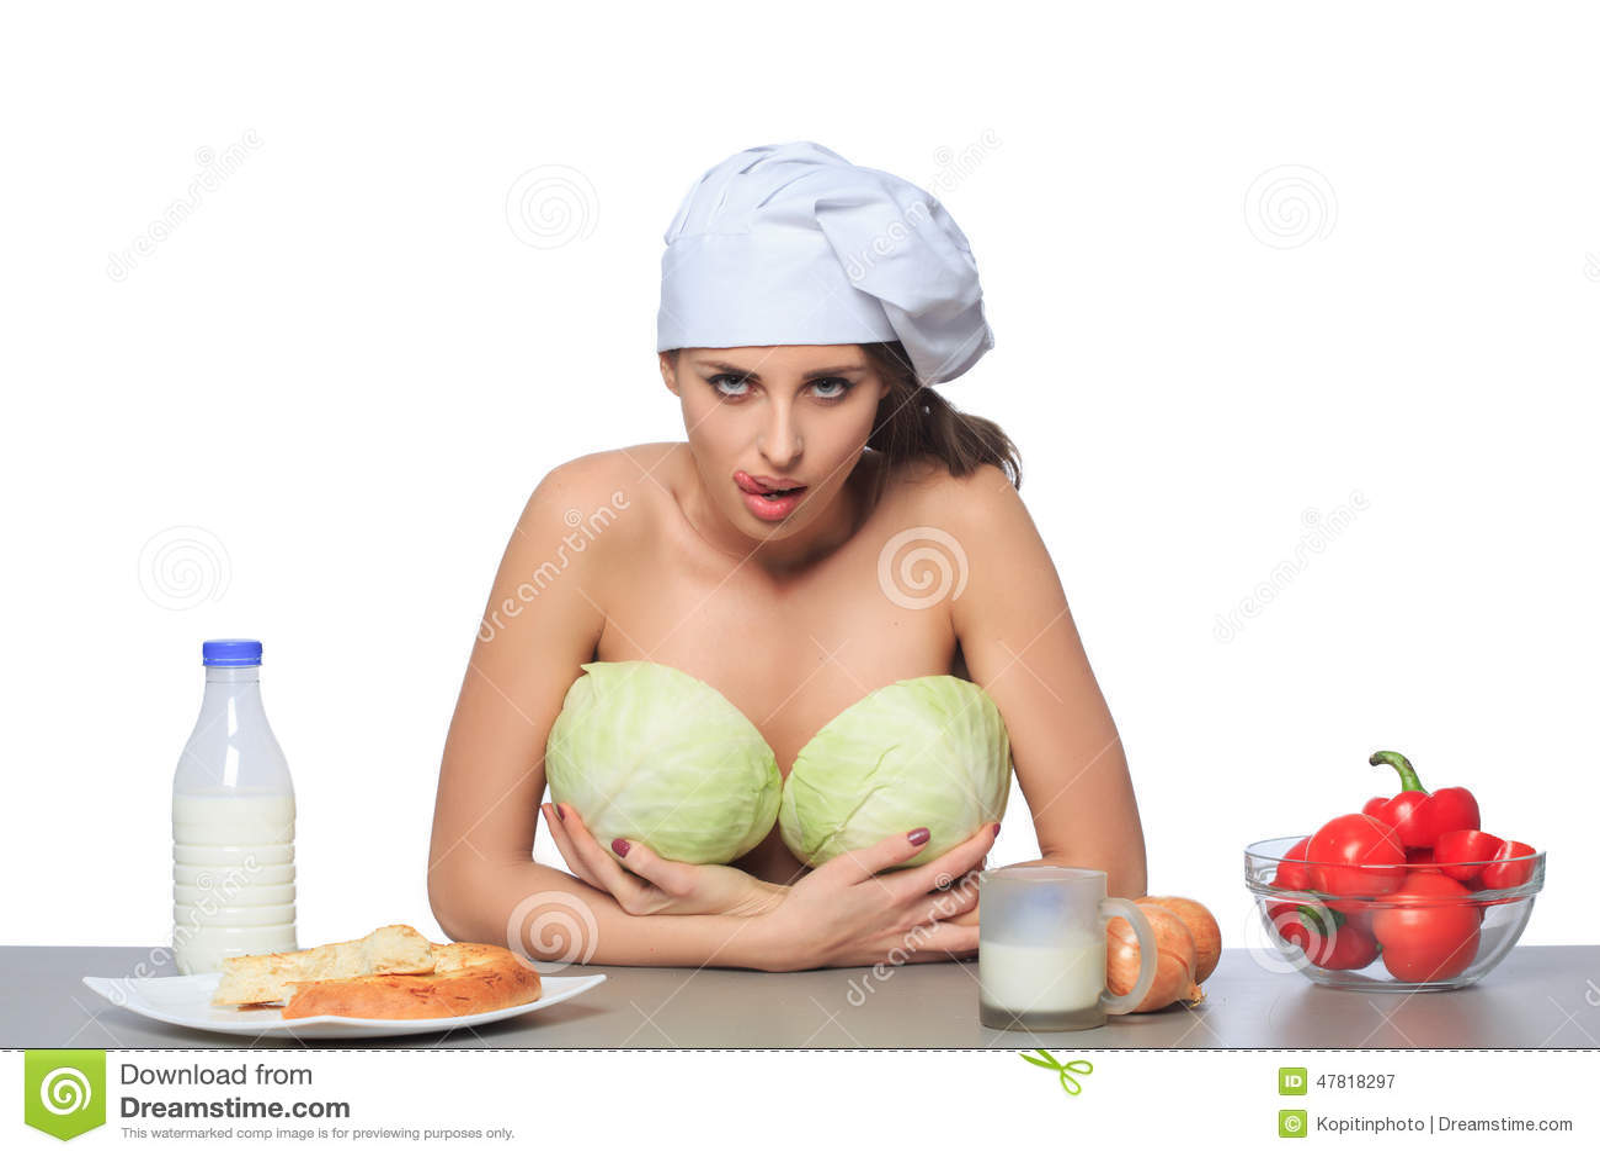 Big Tits Background 42